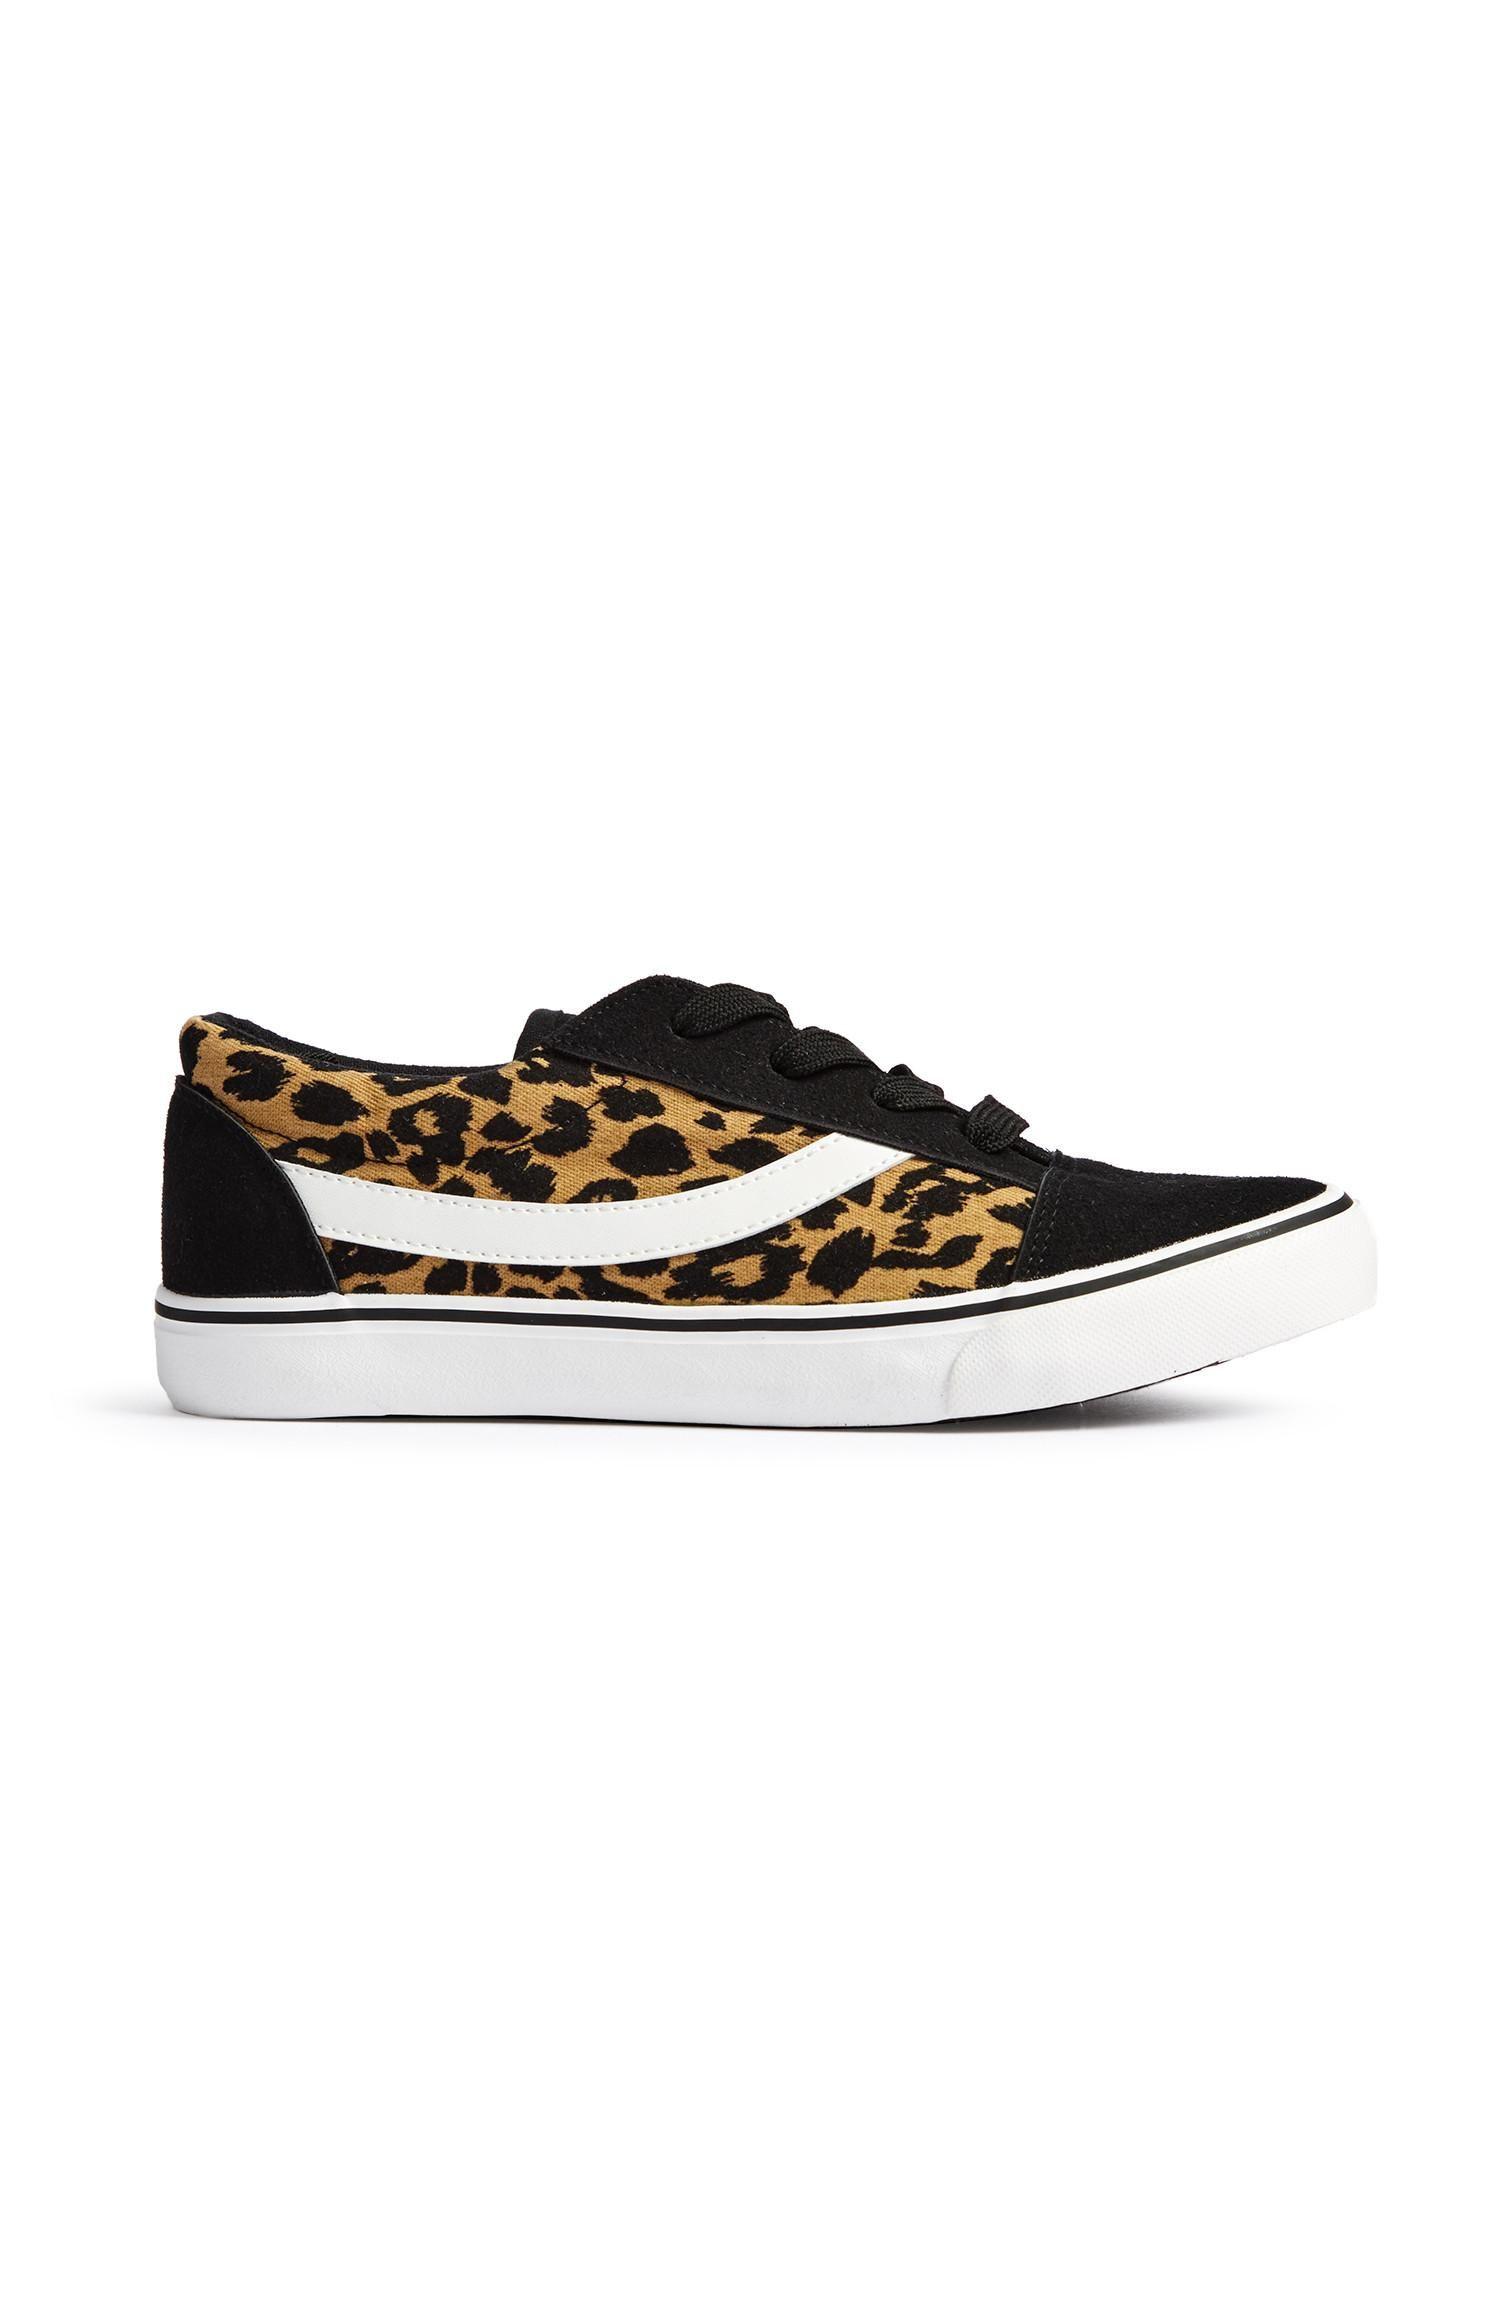 Leopard print pumps, Leopard sneakers